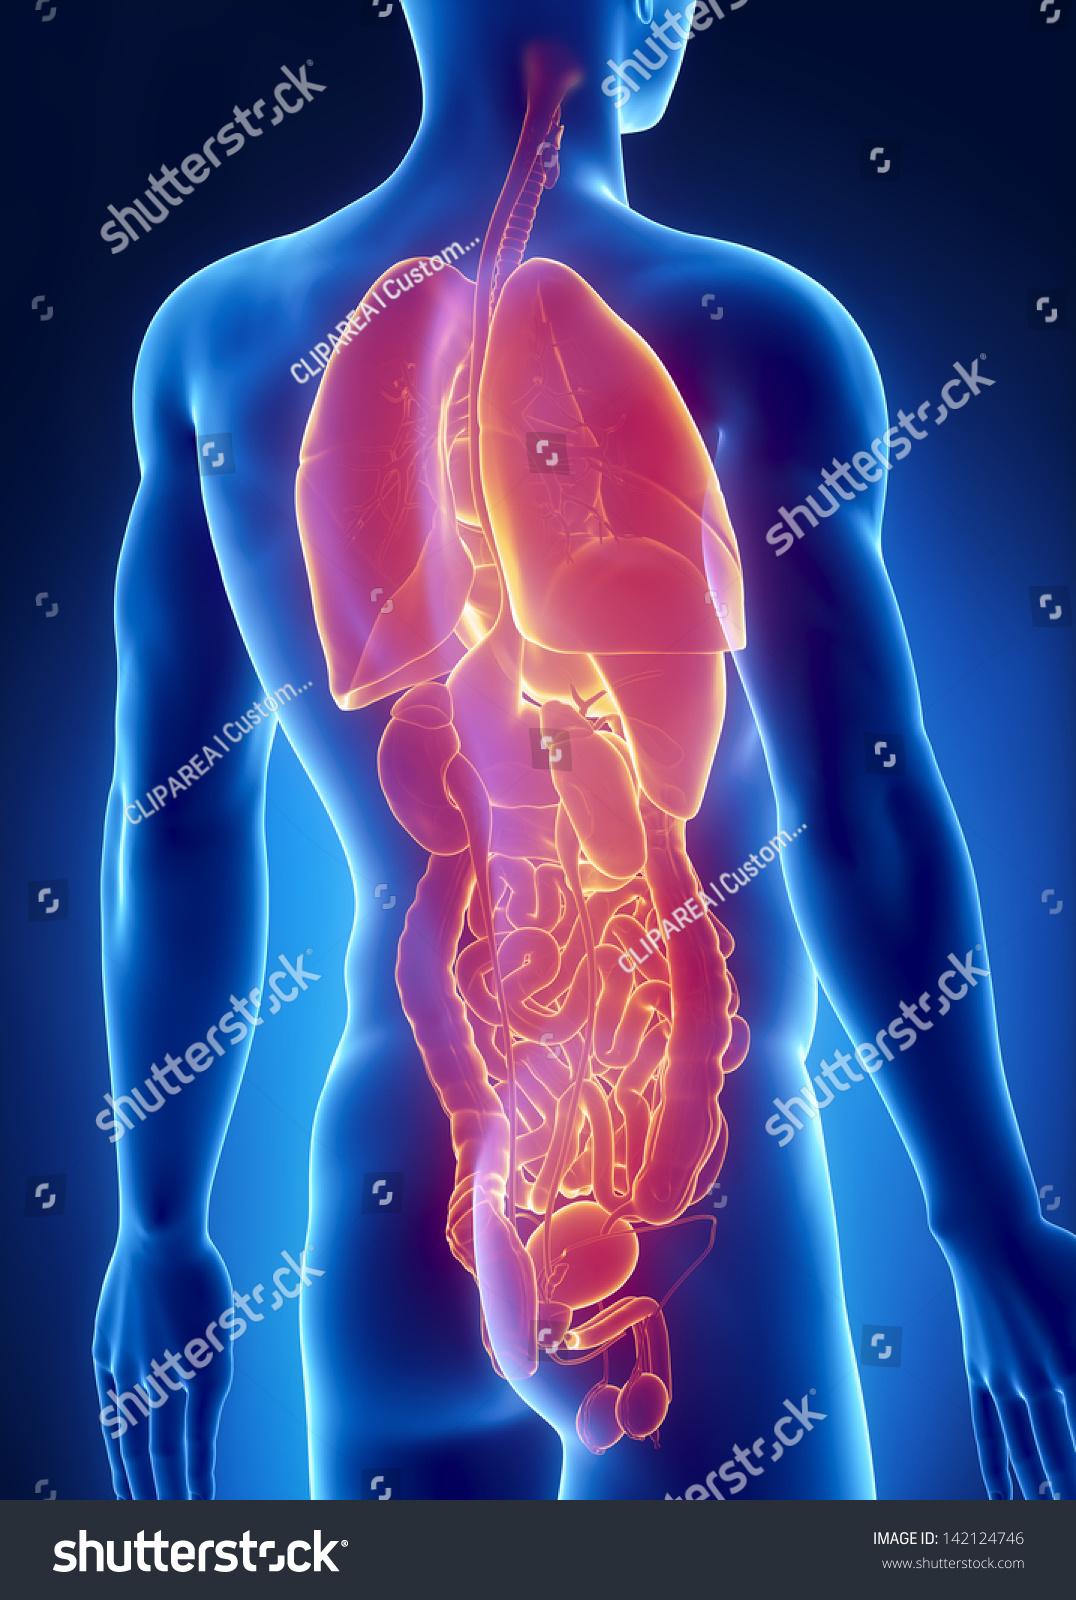 Royalty Free Stock Illustration Of Man Organs Anatomy Posterior Xray